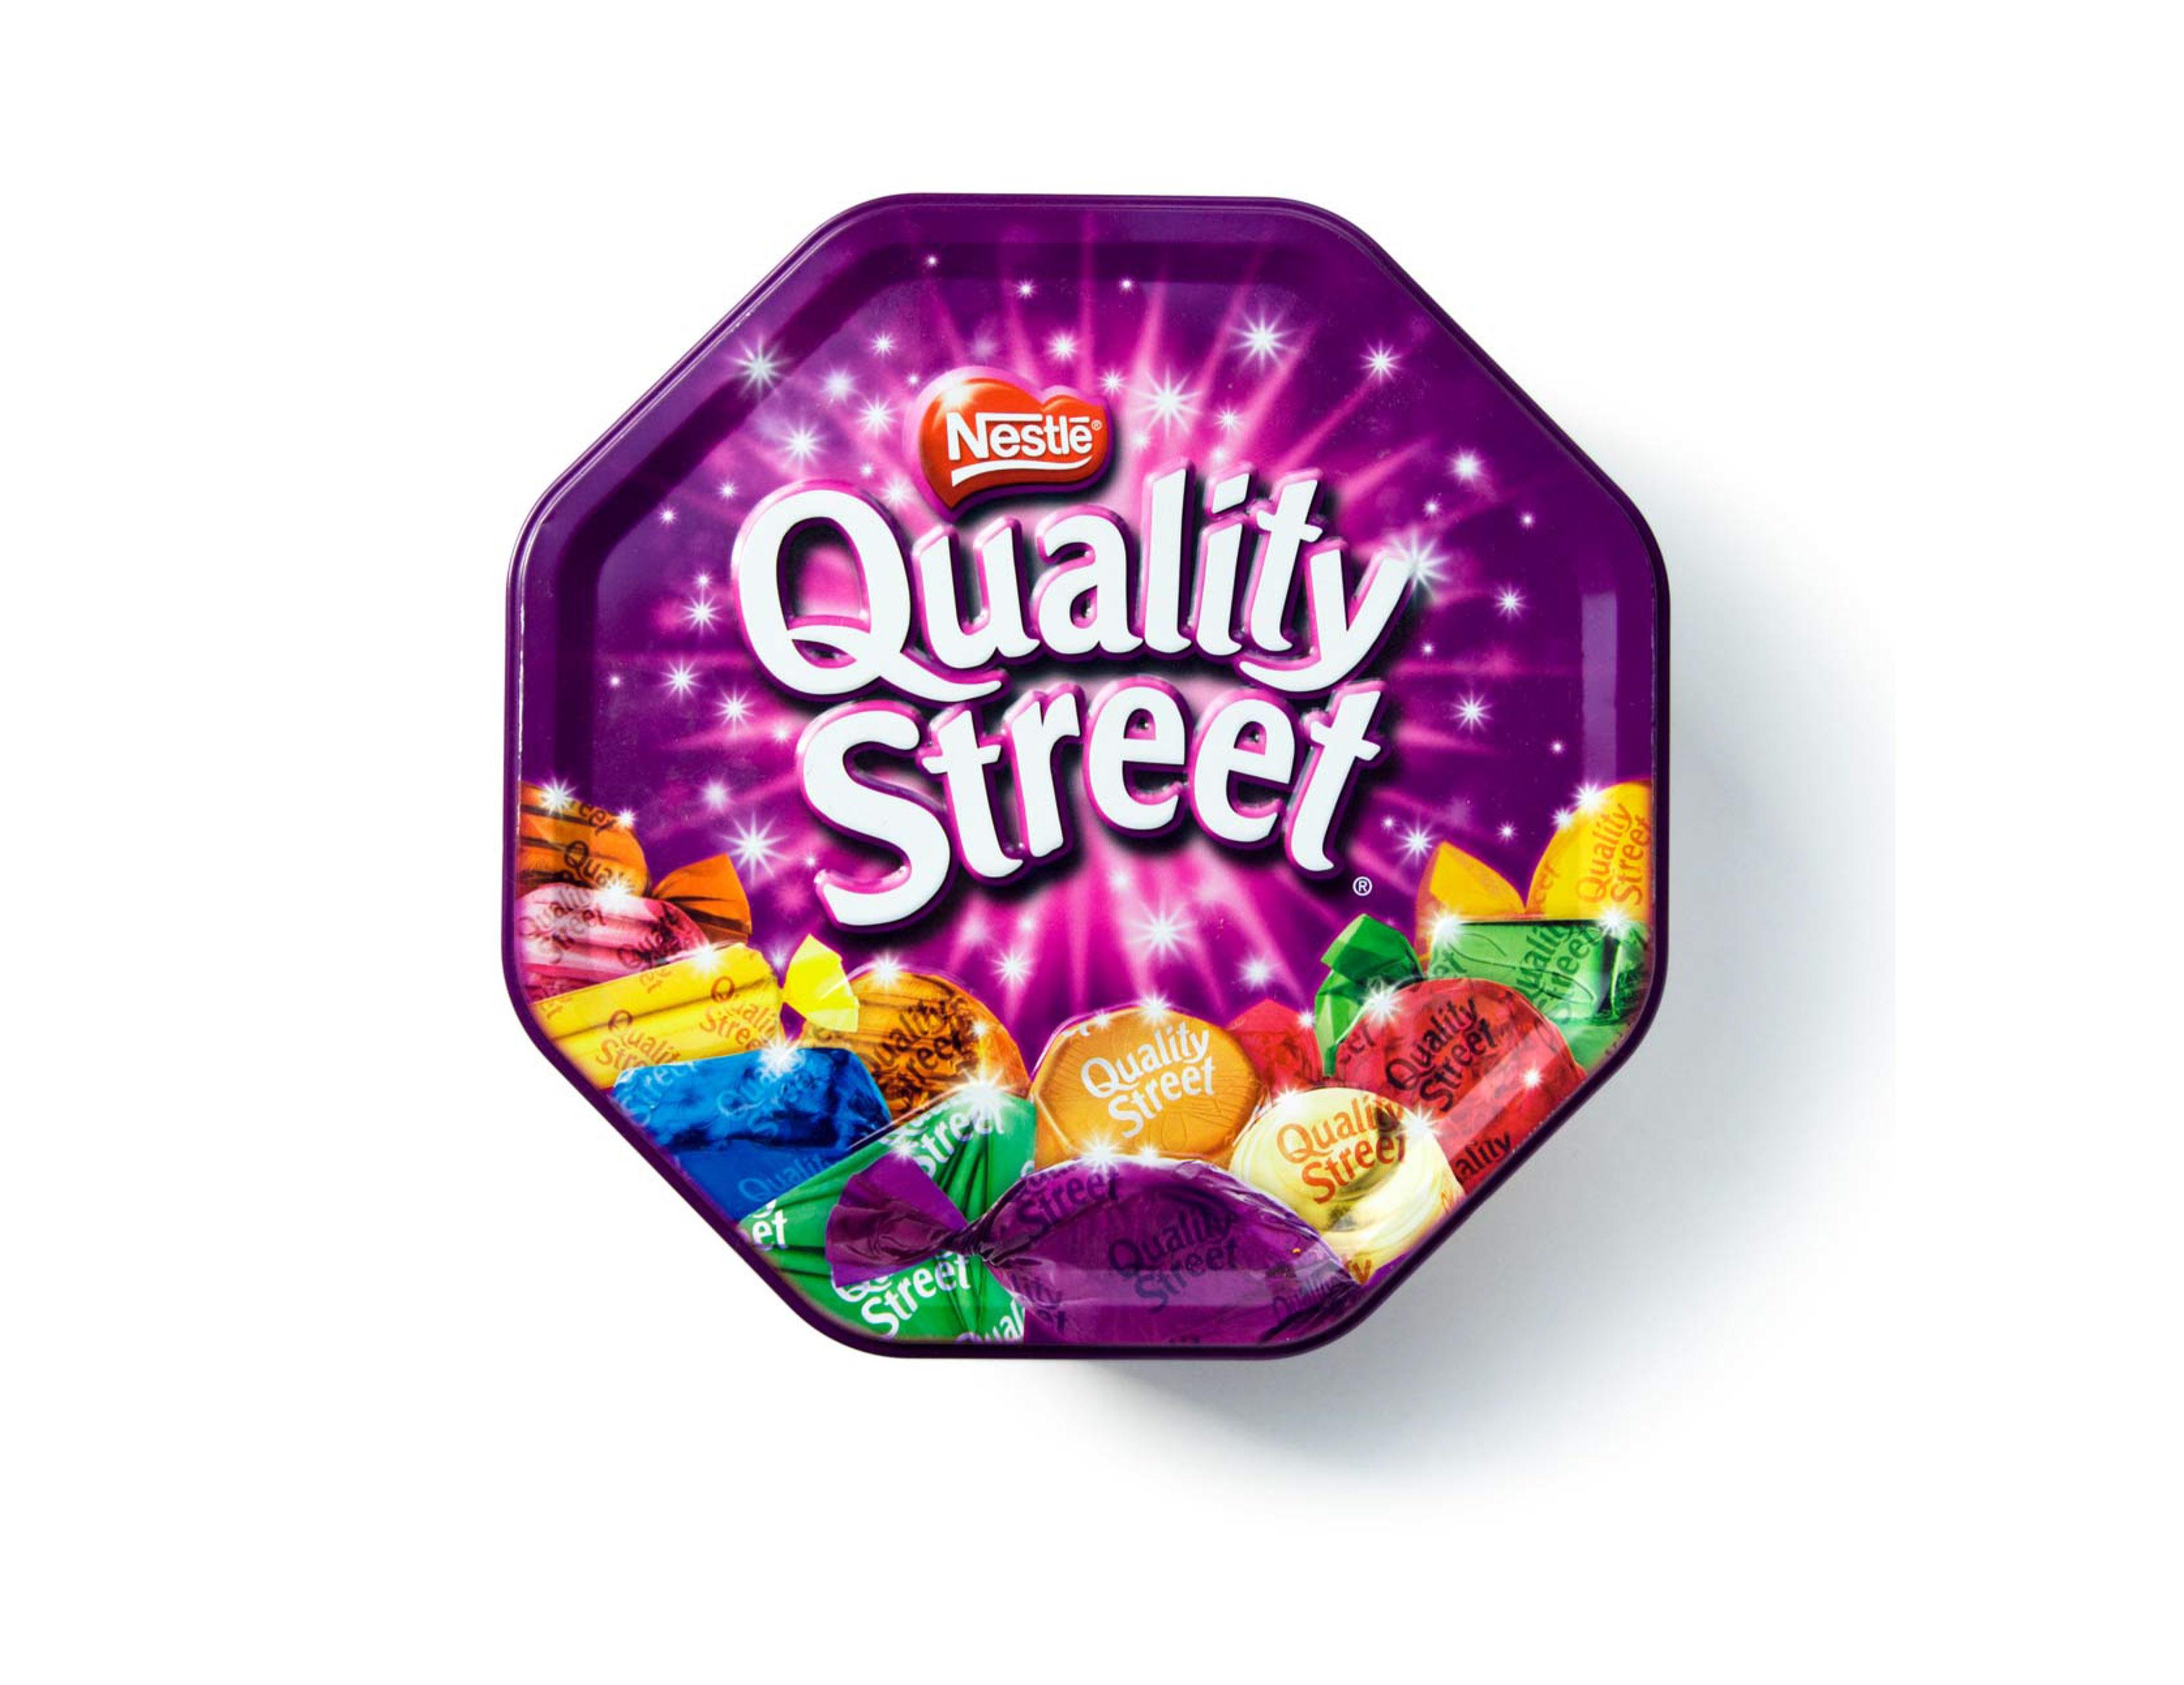 Quality Street Rebranding